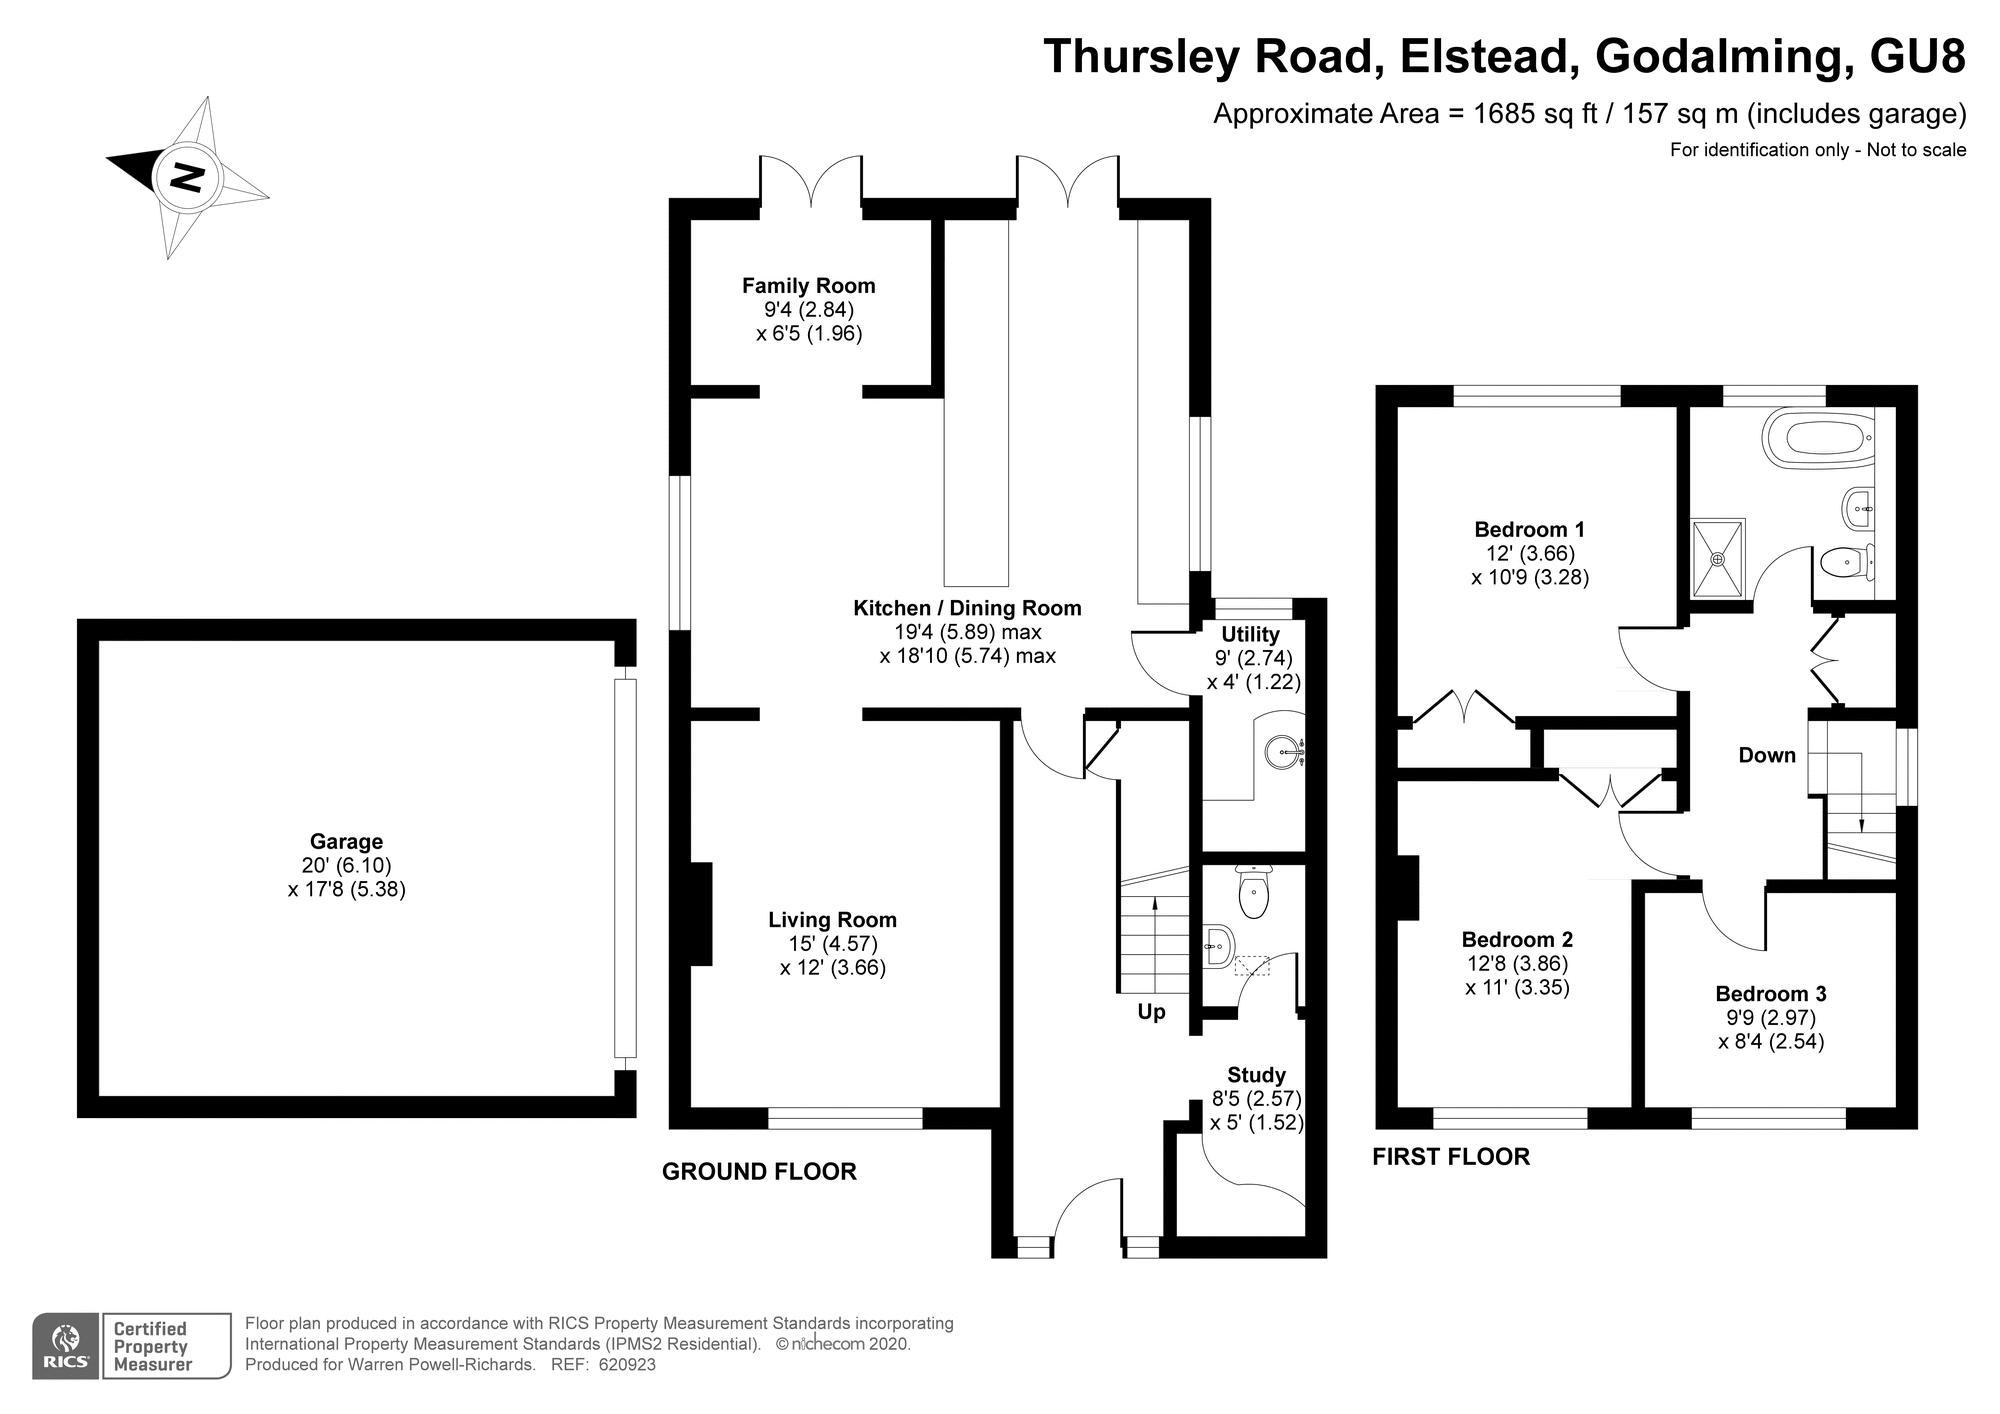 Thursley Road Elstead